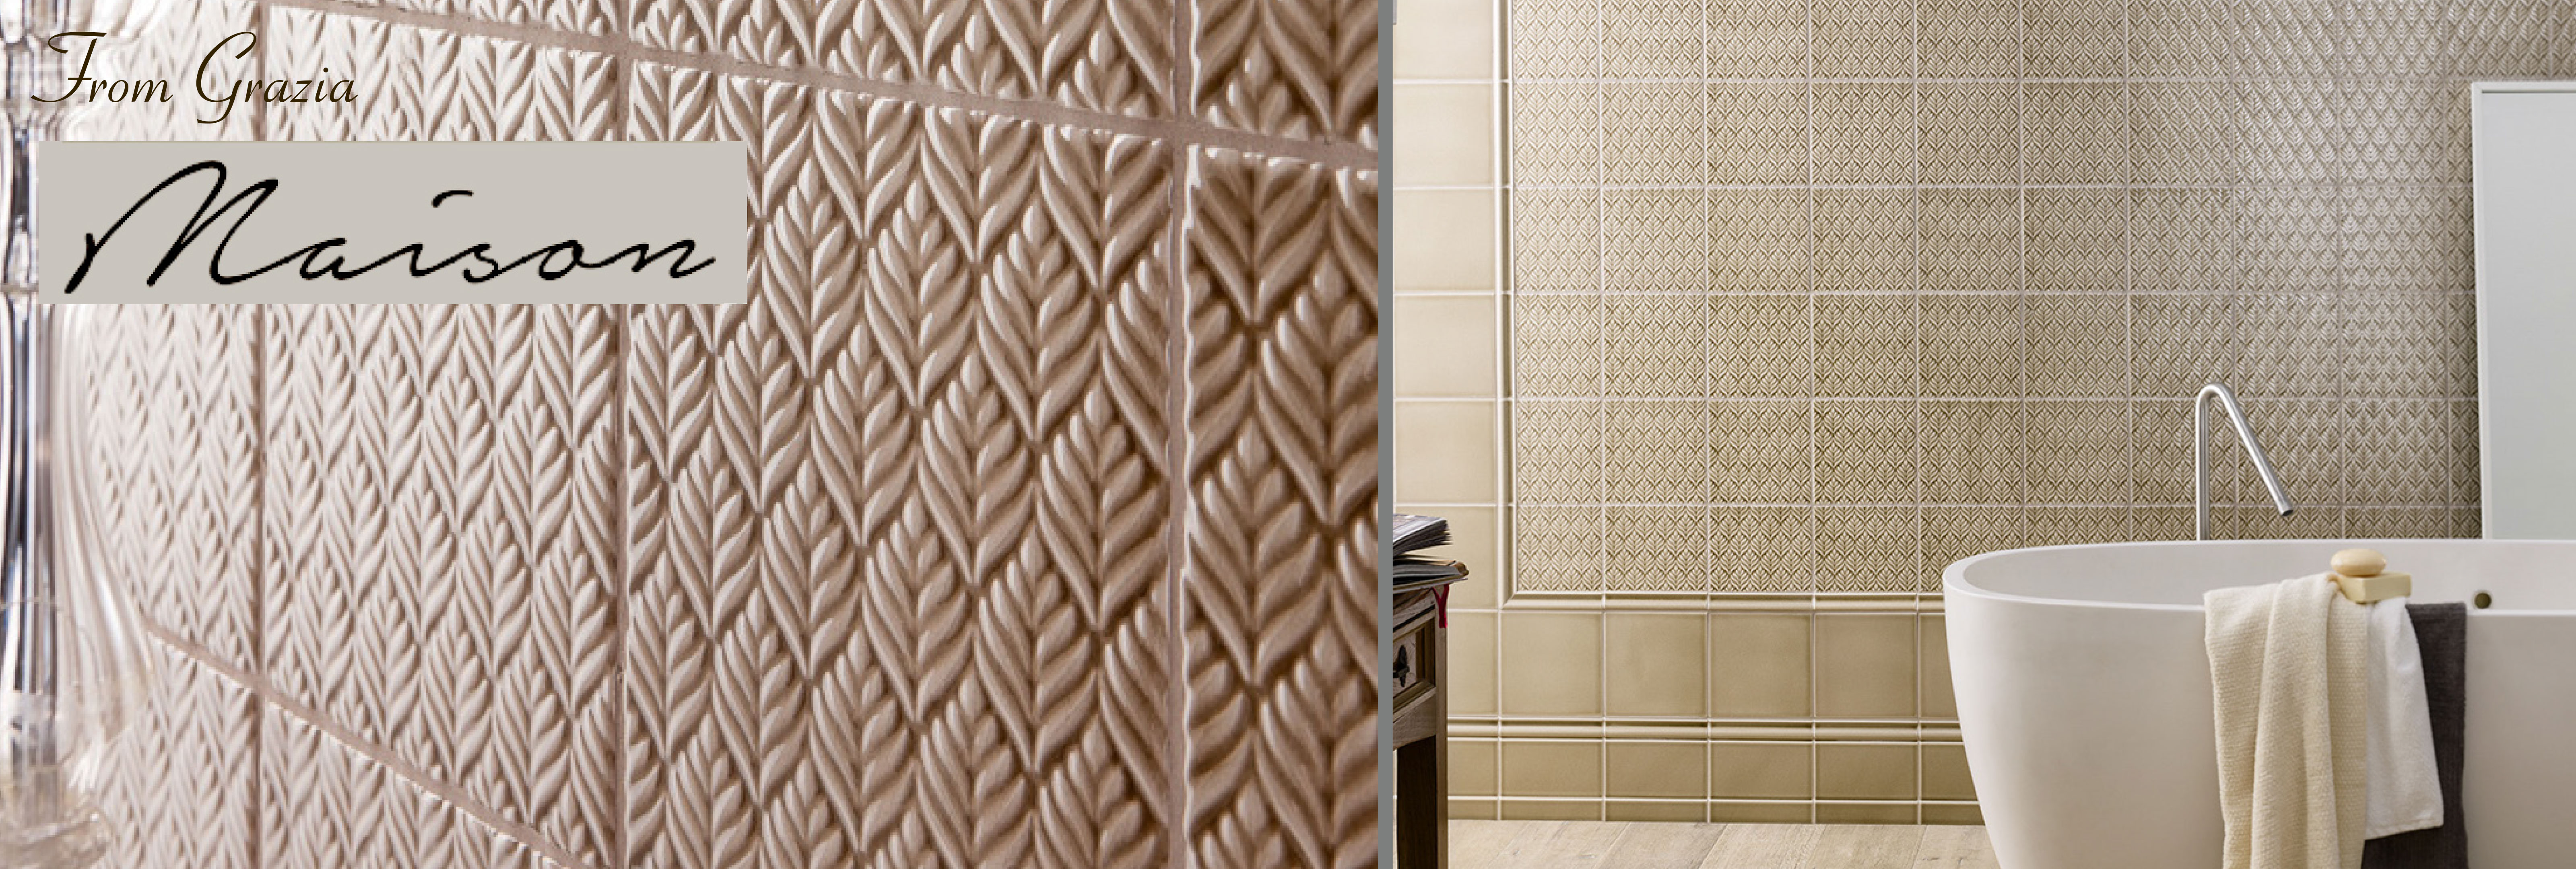 Grazia Maison Italian Ceramic Wall Tile